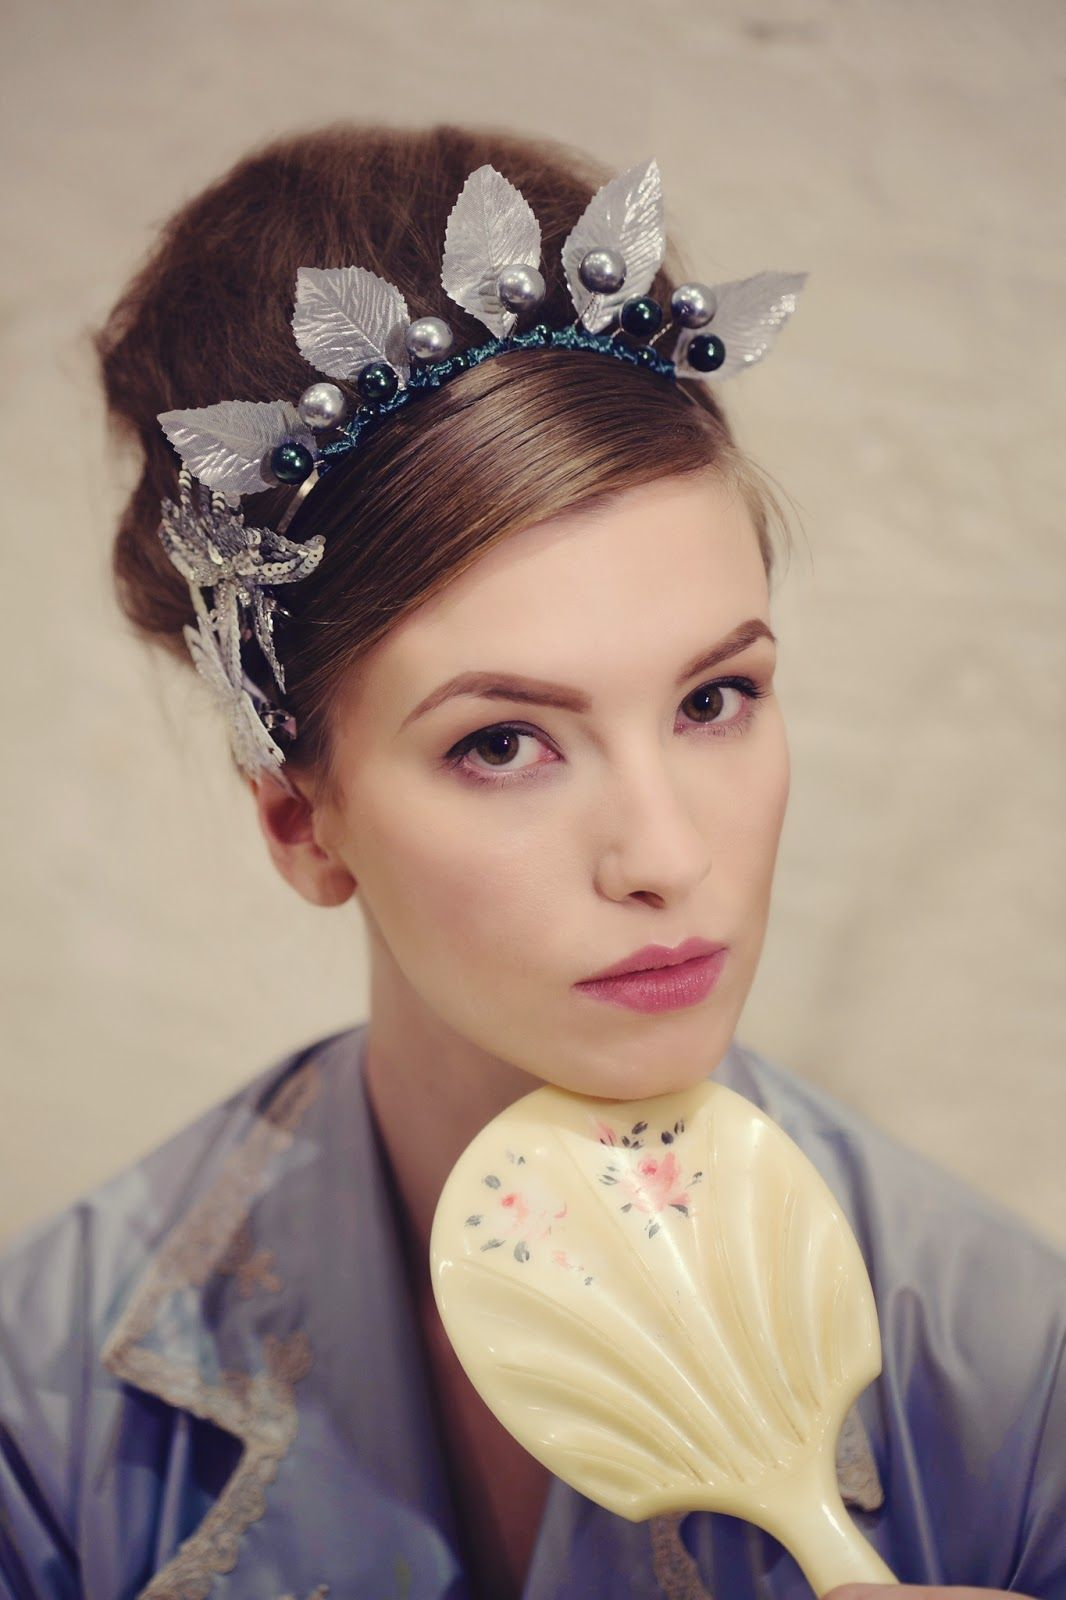 Vintage head piece#prom   Prom hair accessories, Hair ...